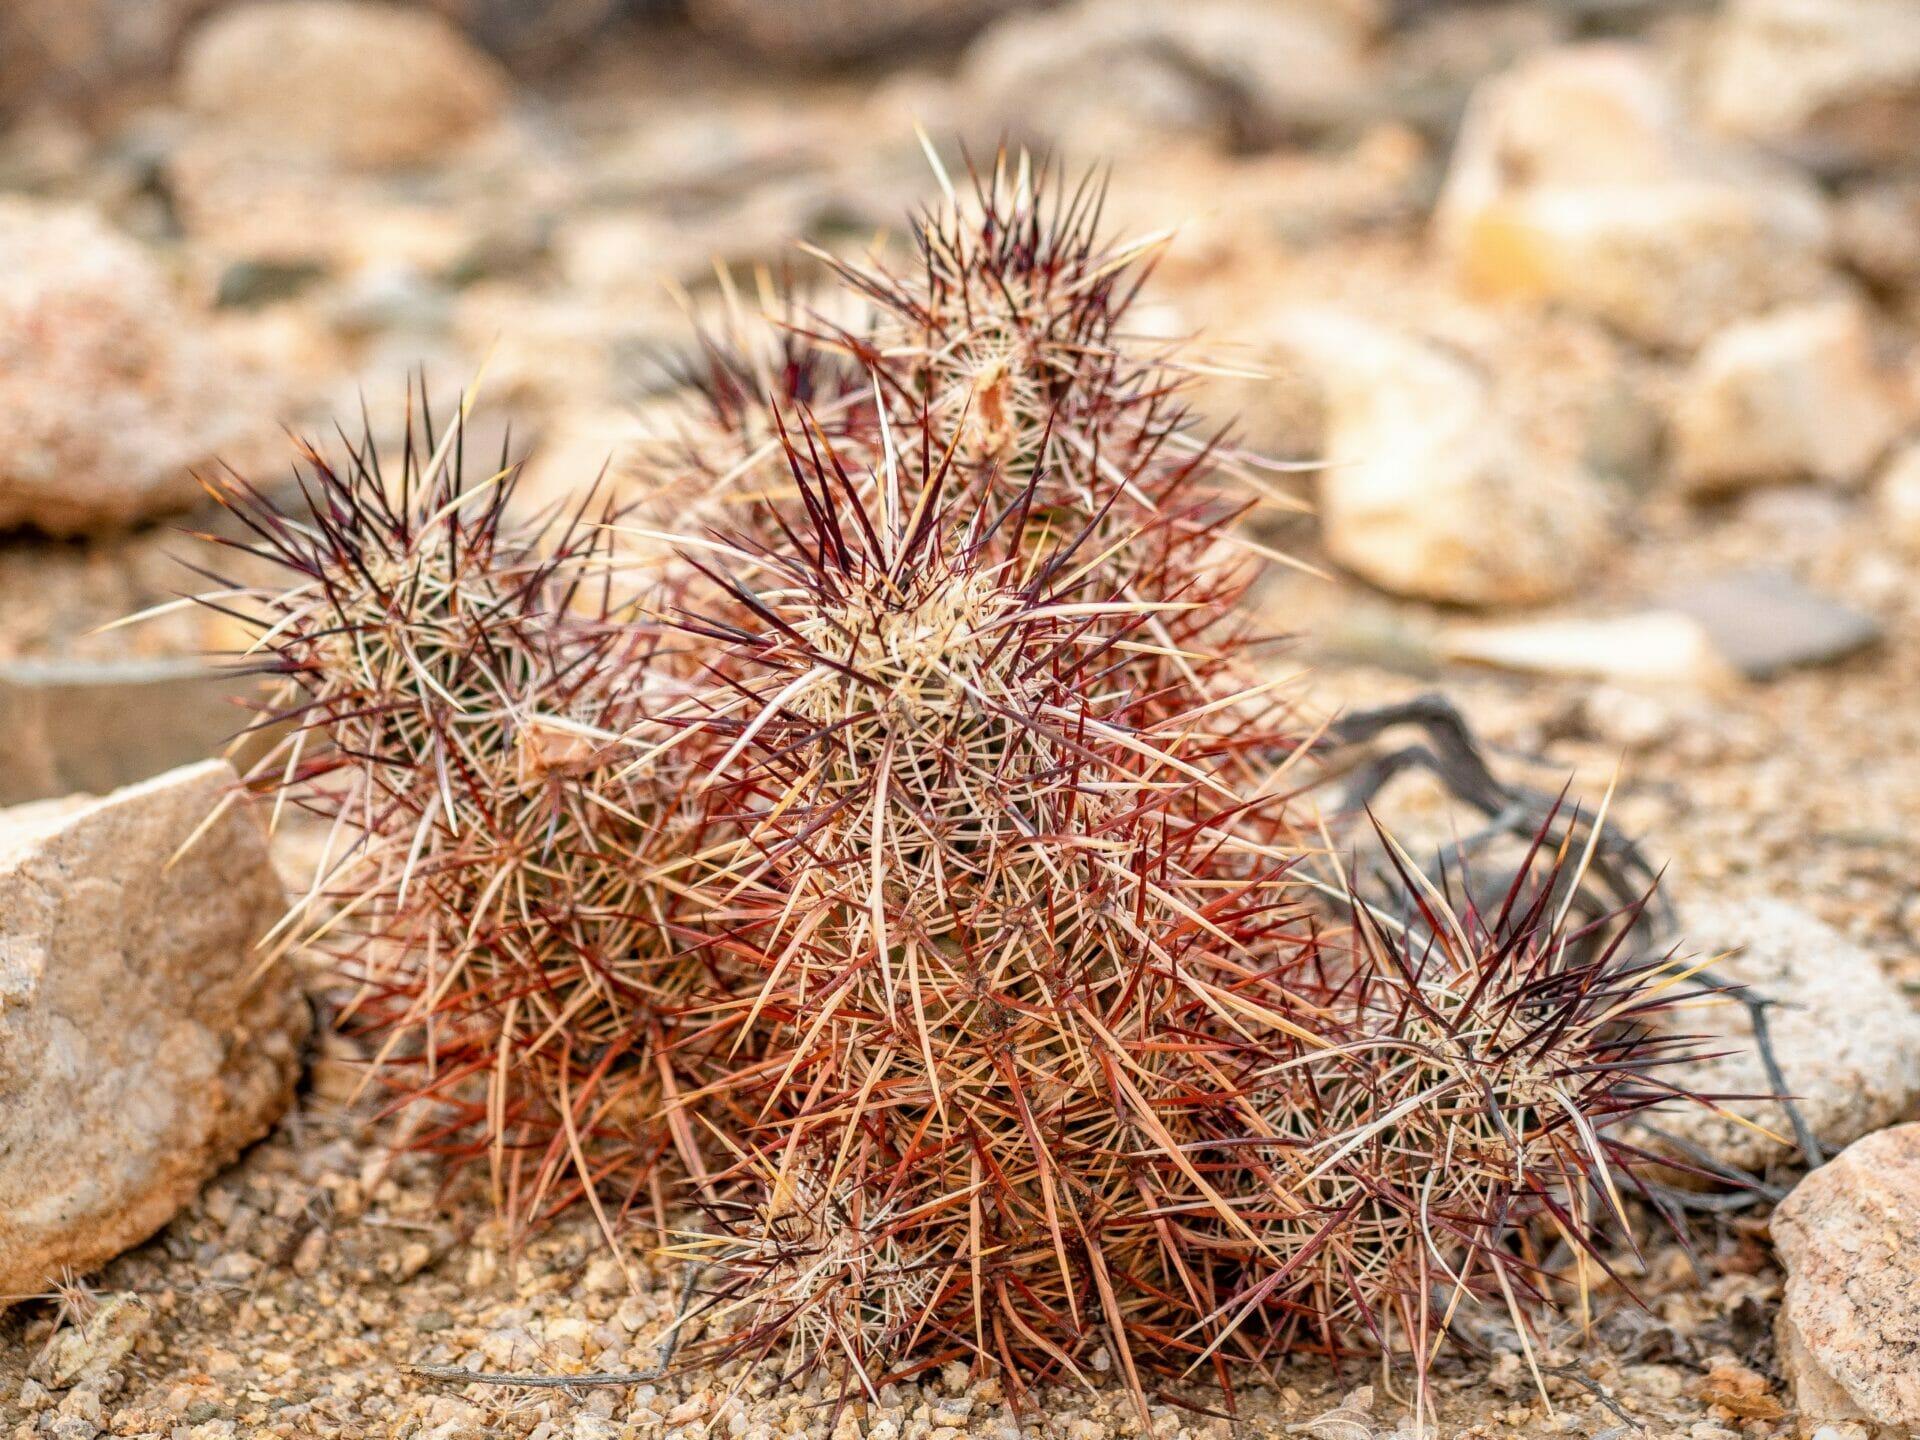 Joshua Tree National Park 1-day hiking itinerary